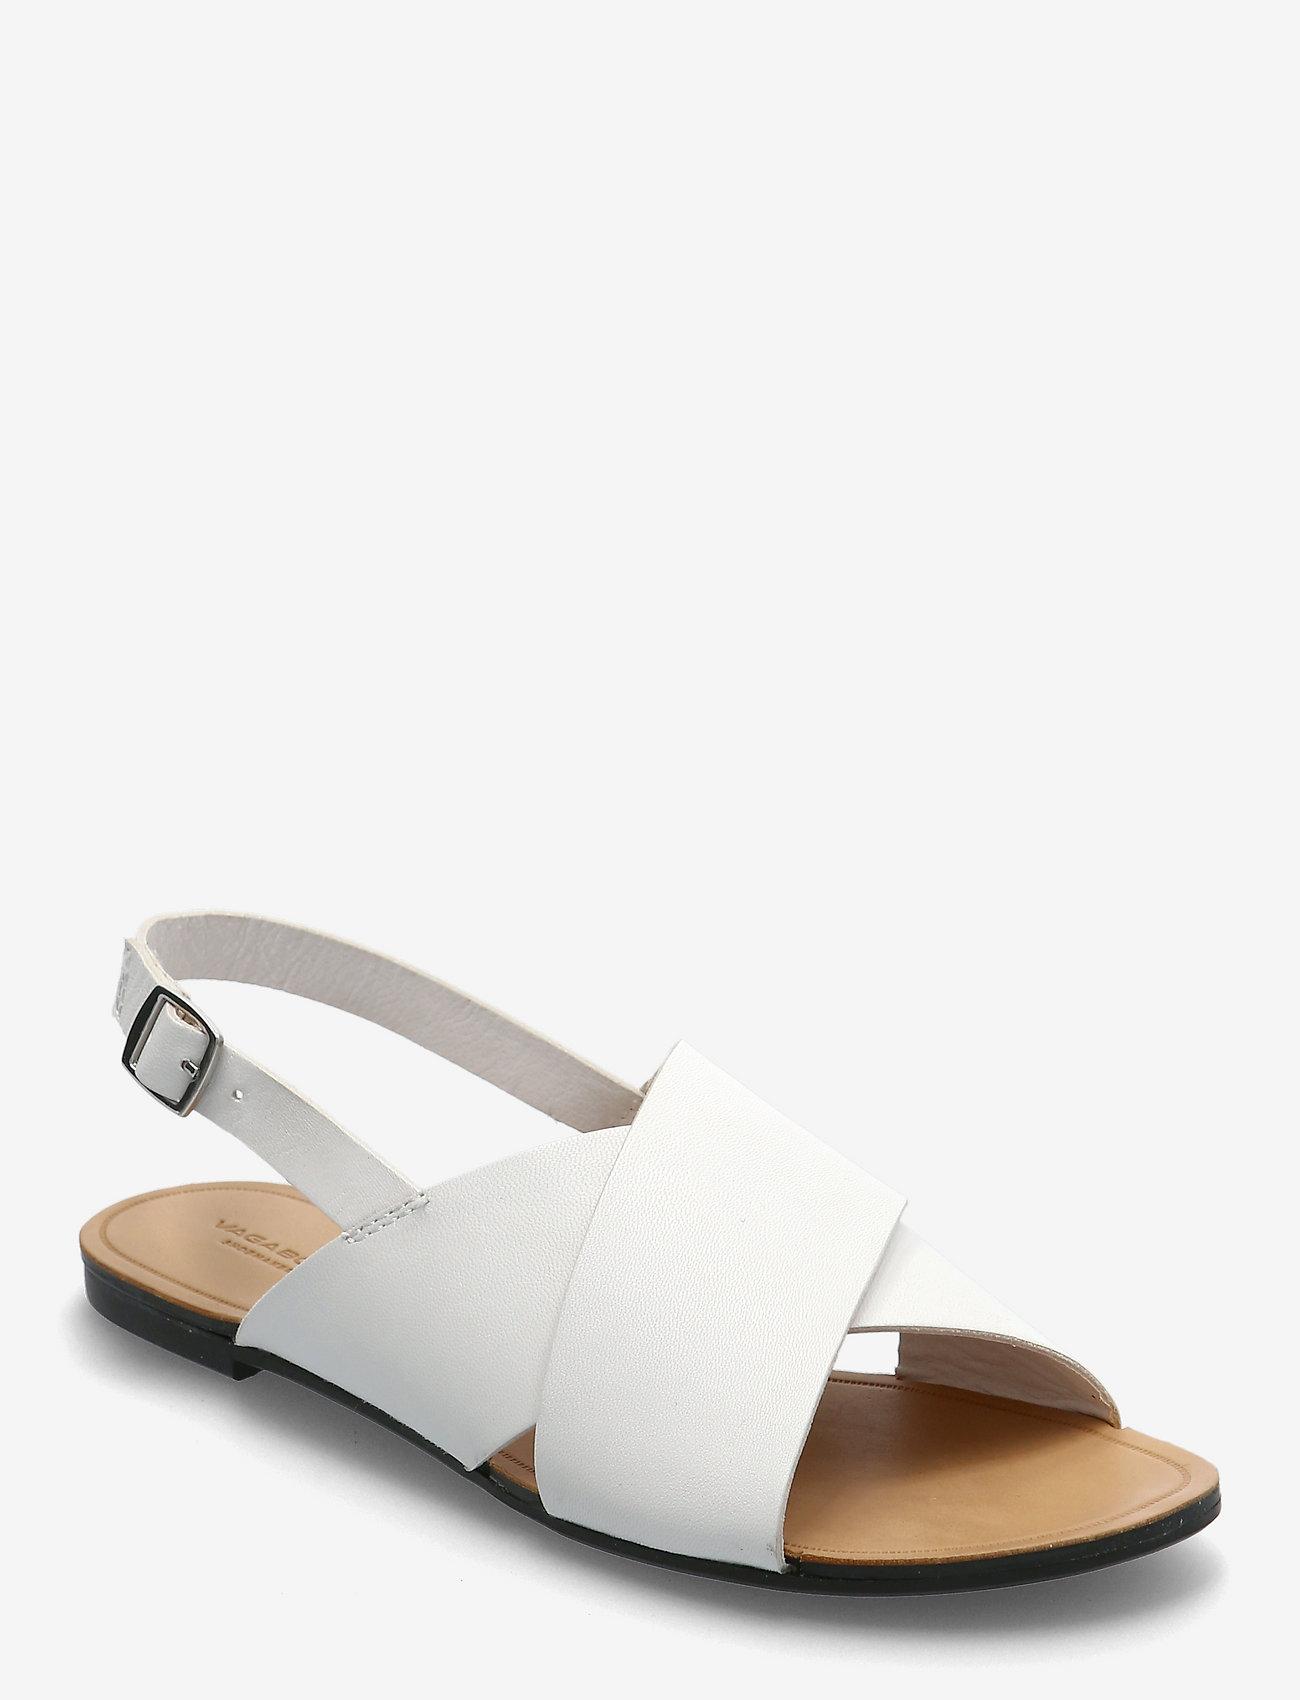 VAGABOND - TIA - płaskie sandały - white - 0